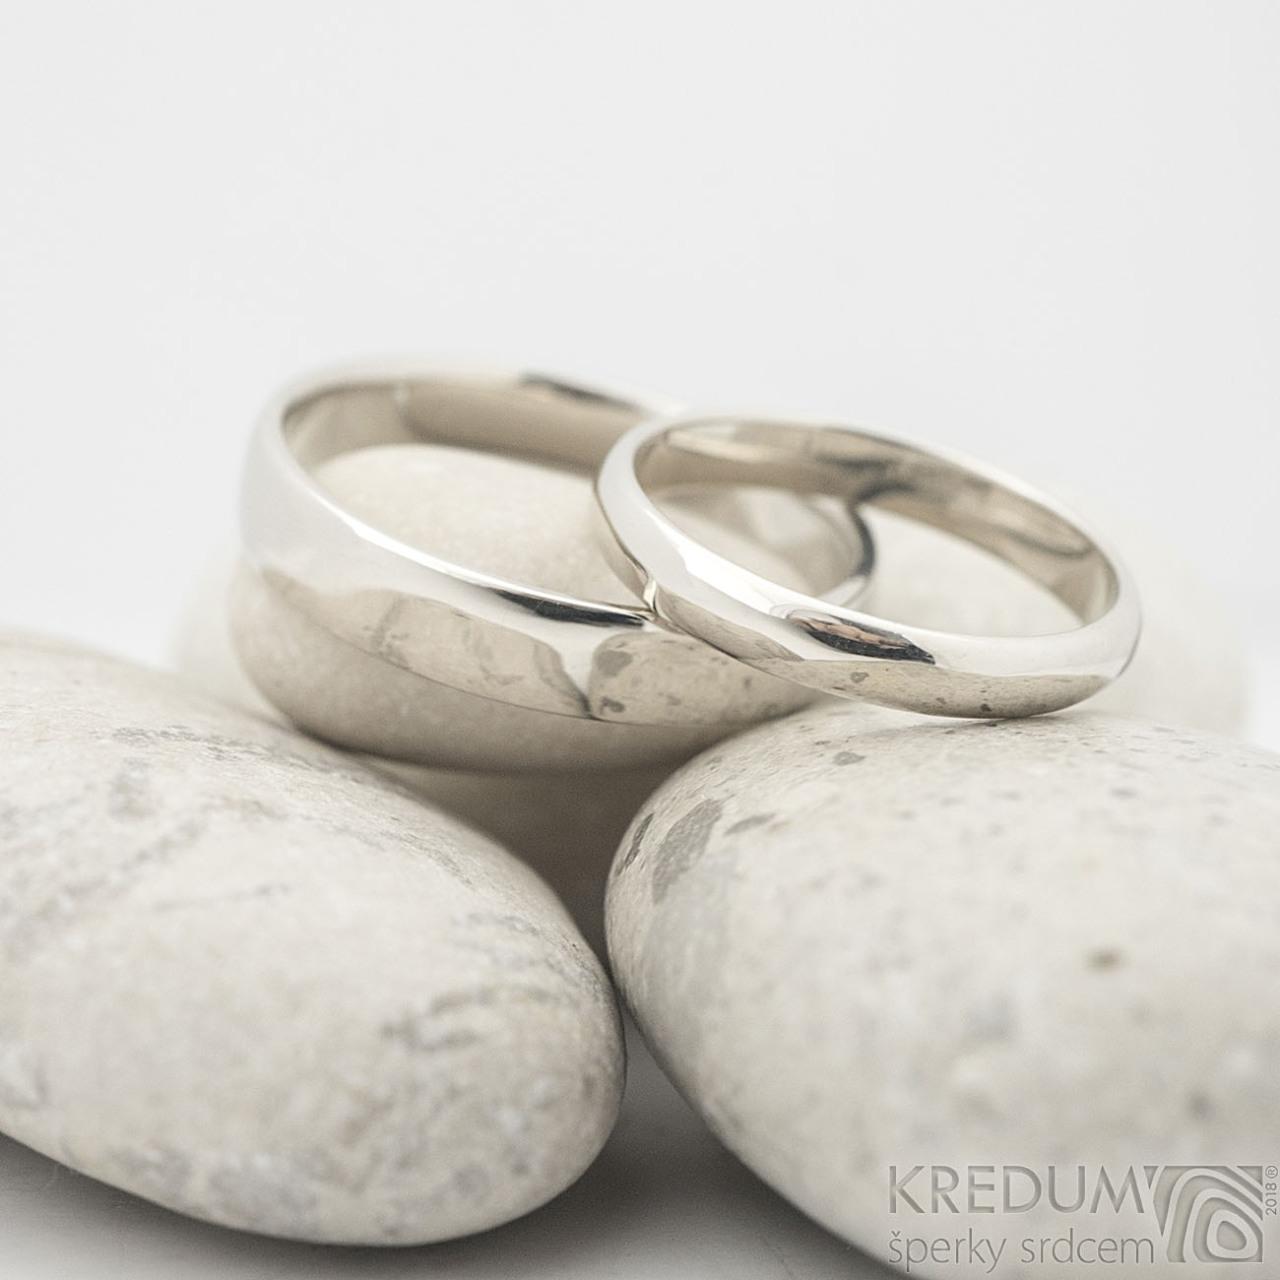 Klasik Gold White Zlaty Snubni Prsten Vyroba Hand Made Snubni